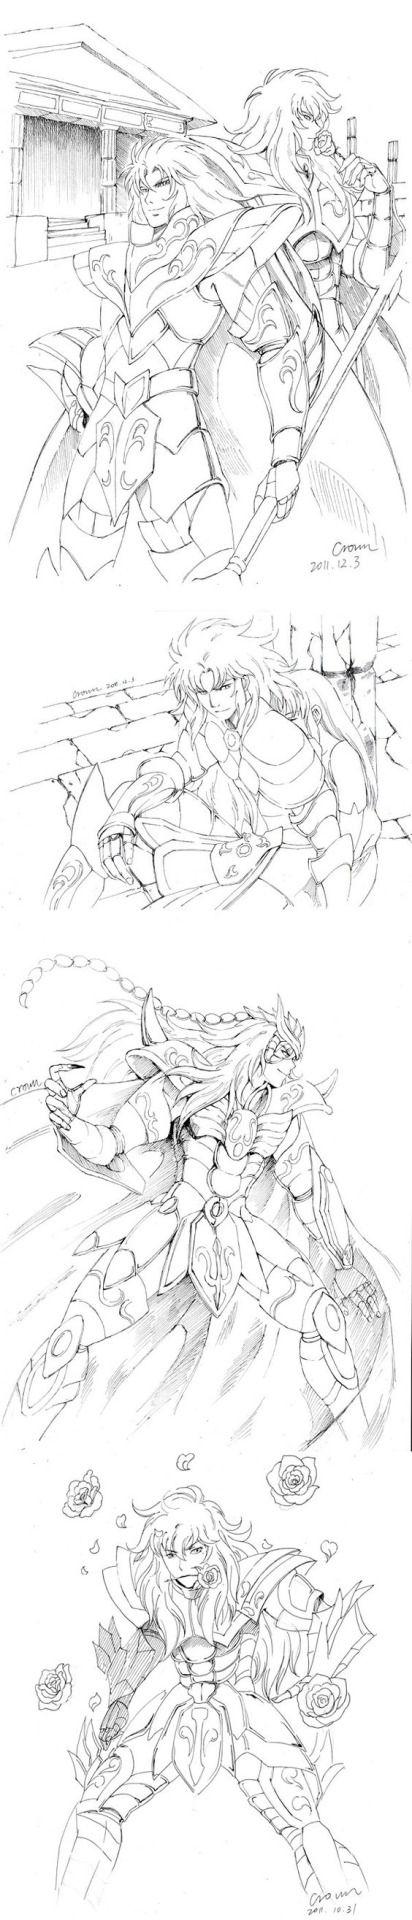 Sea Dragon Kanon, Pisces Aphrodite, Gemini Saga, Virgo Shaka and Scorpio Milo